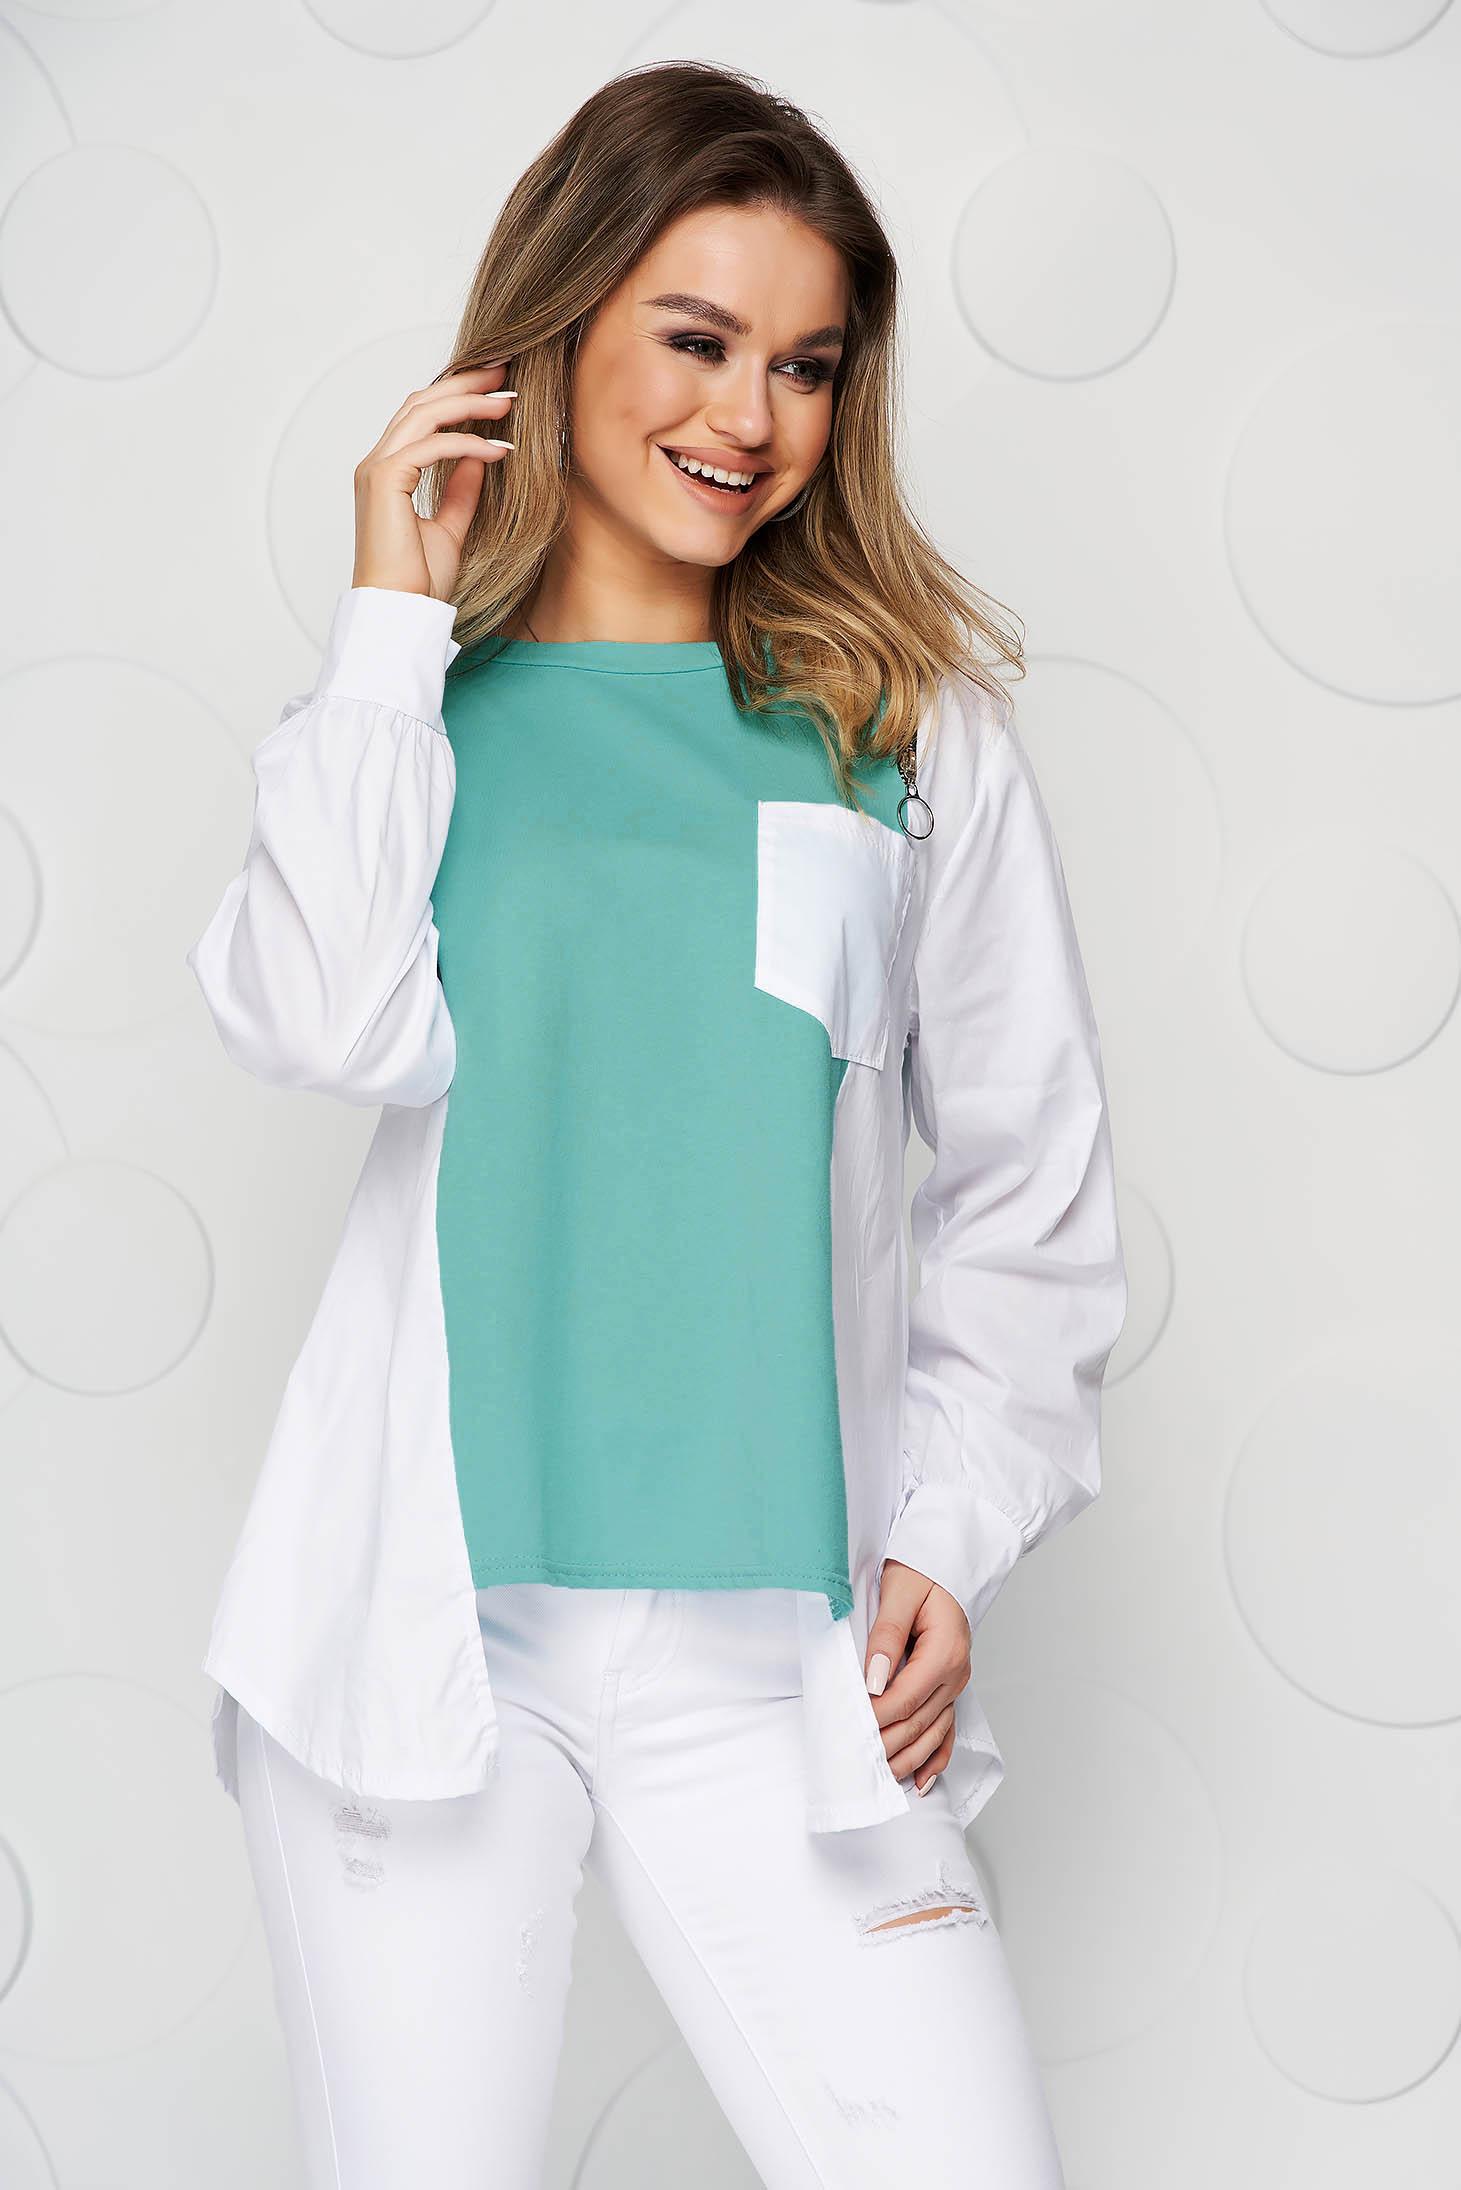 Green women`s blouse cotton asymmetrical loose fit zipper accessory